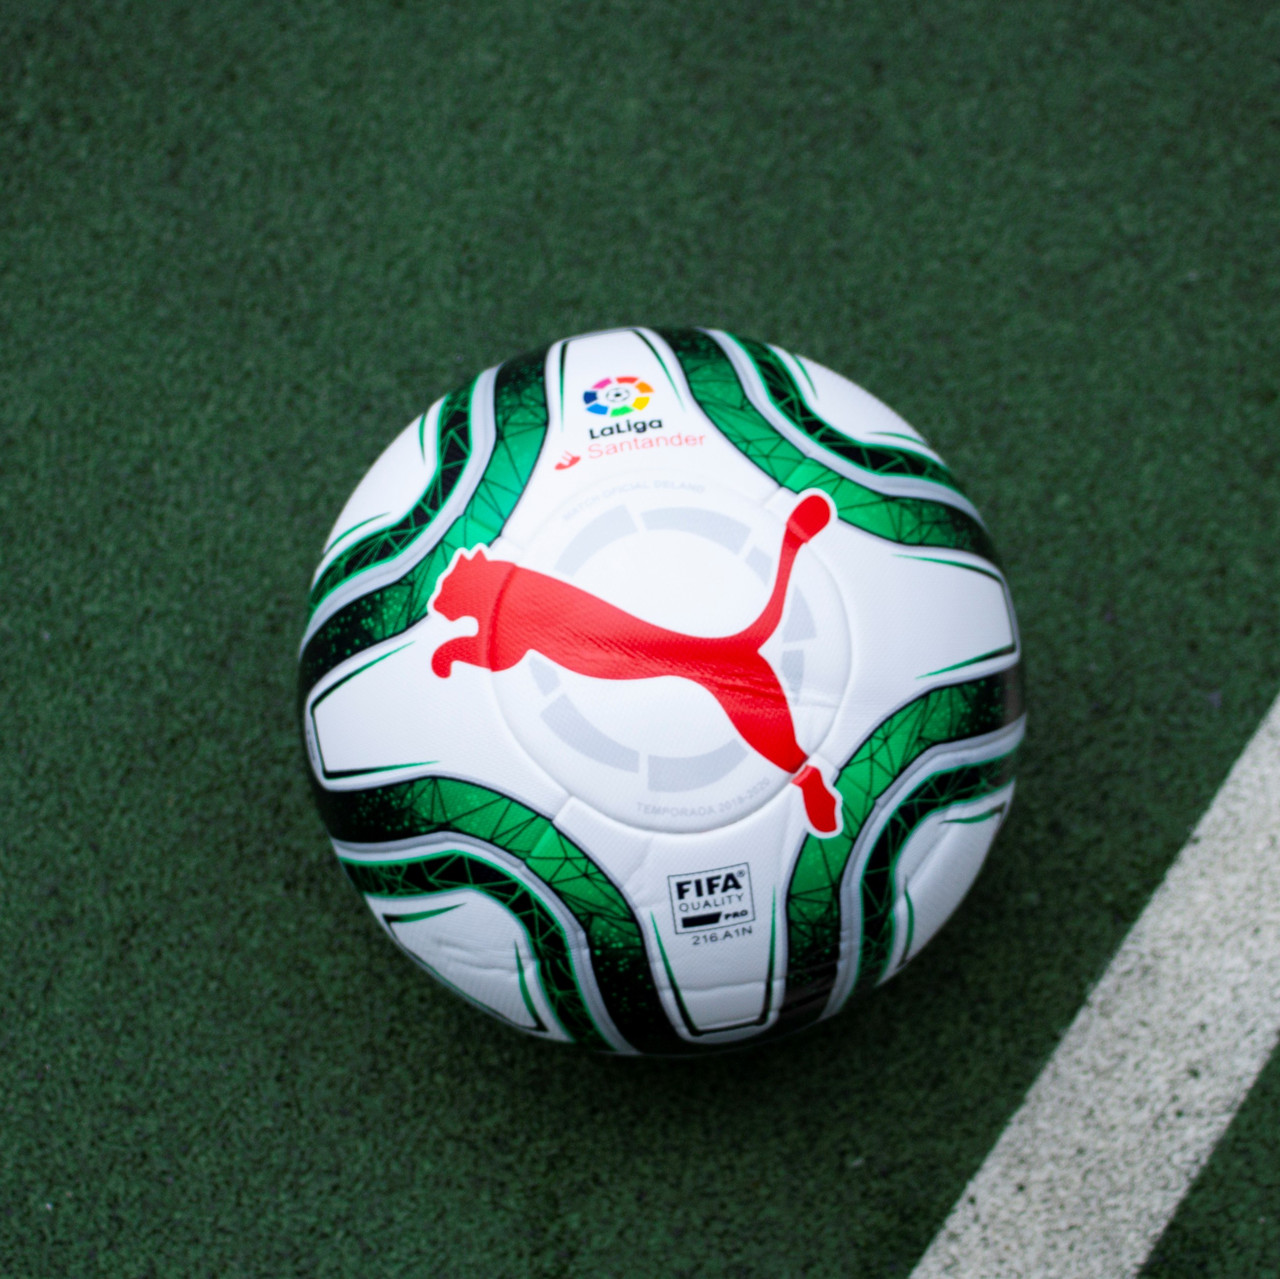 Футбольний м'яч Puma LaLiga 1 FIFA Quality Pro 01